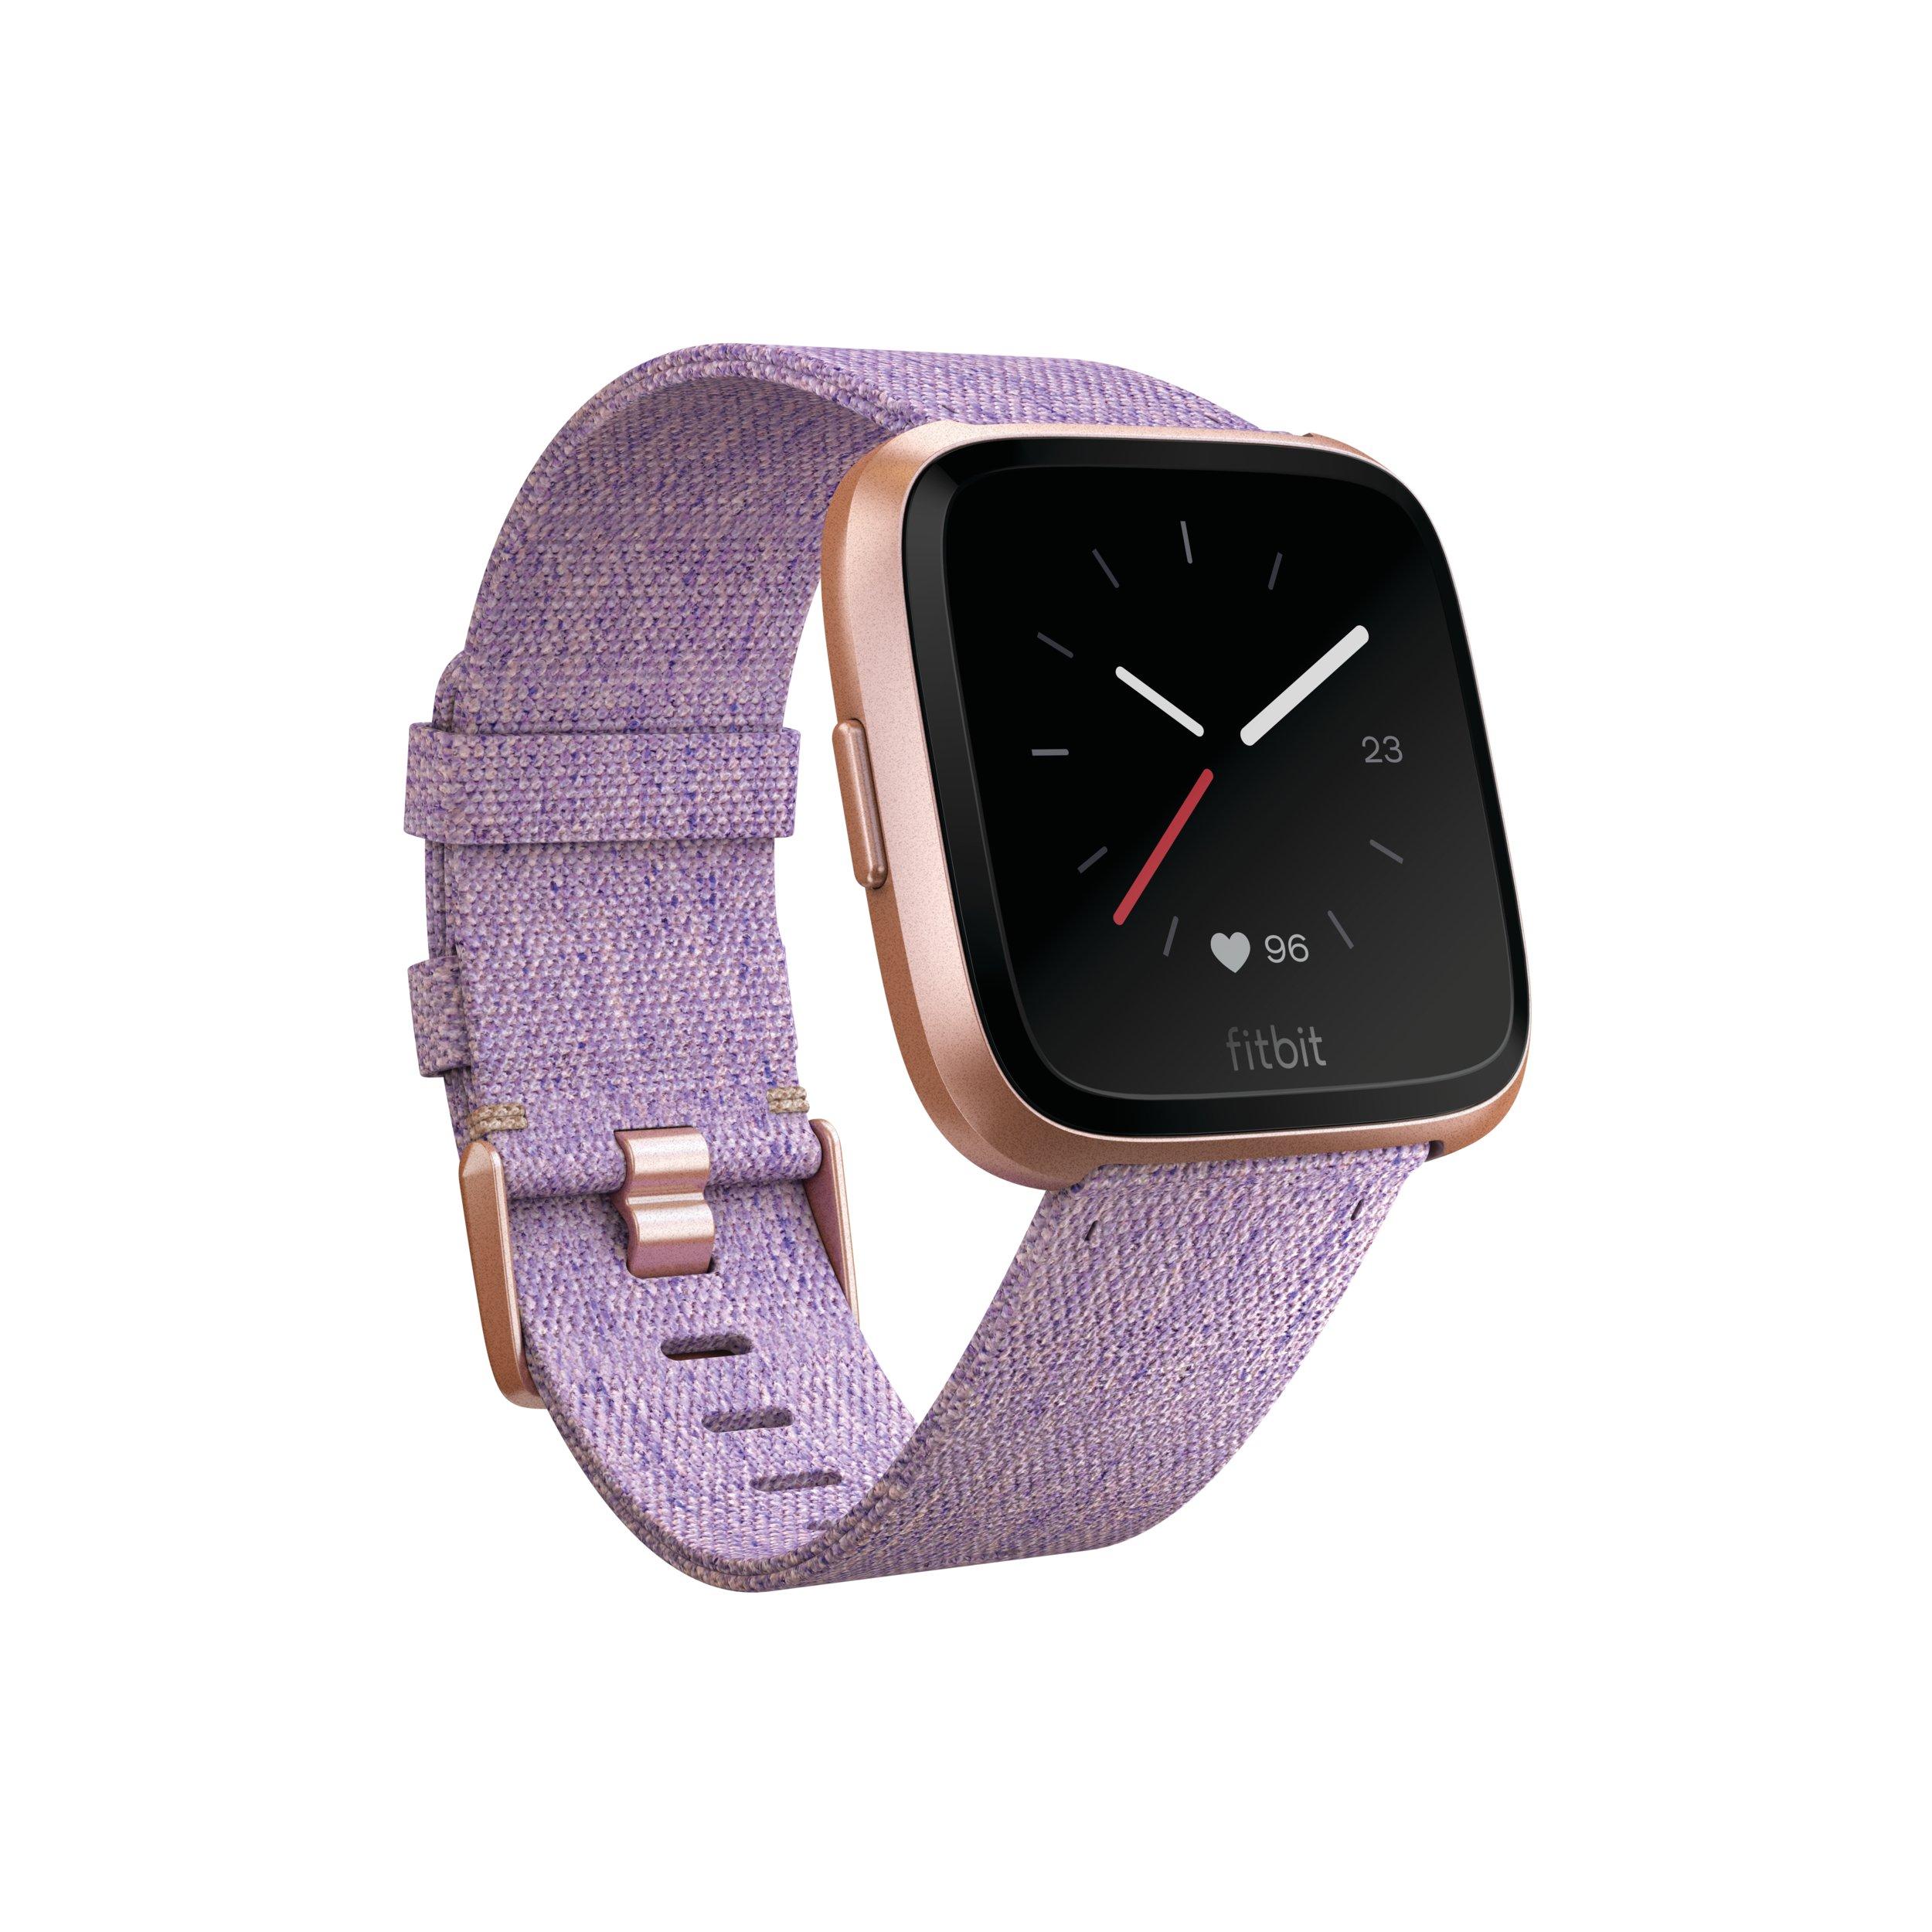 Amazon.com: Fitbit Versa Special Edition Smart Watch